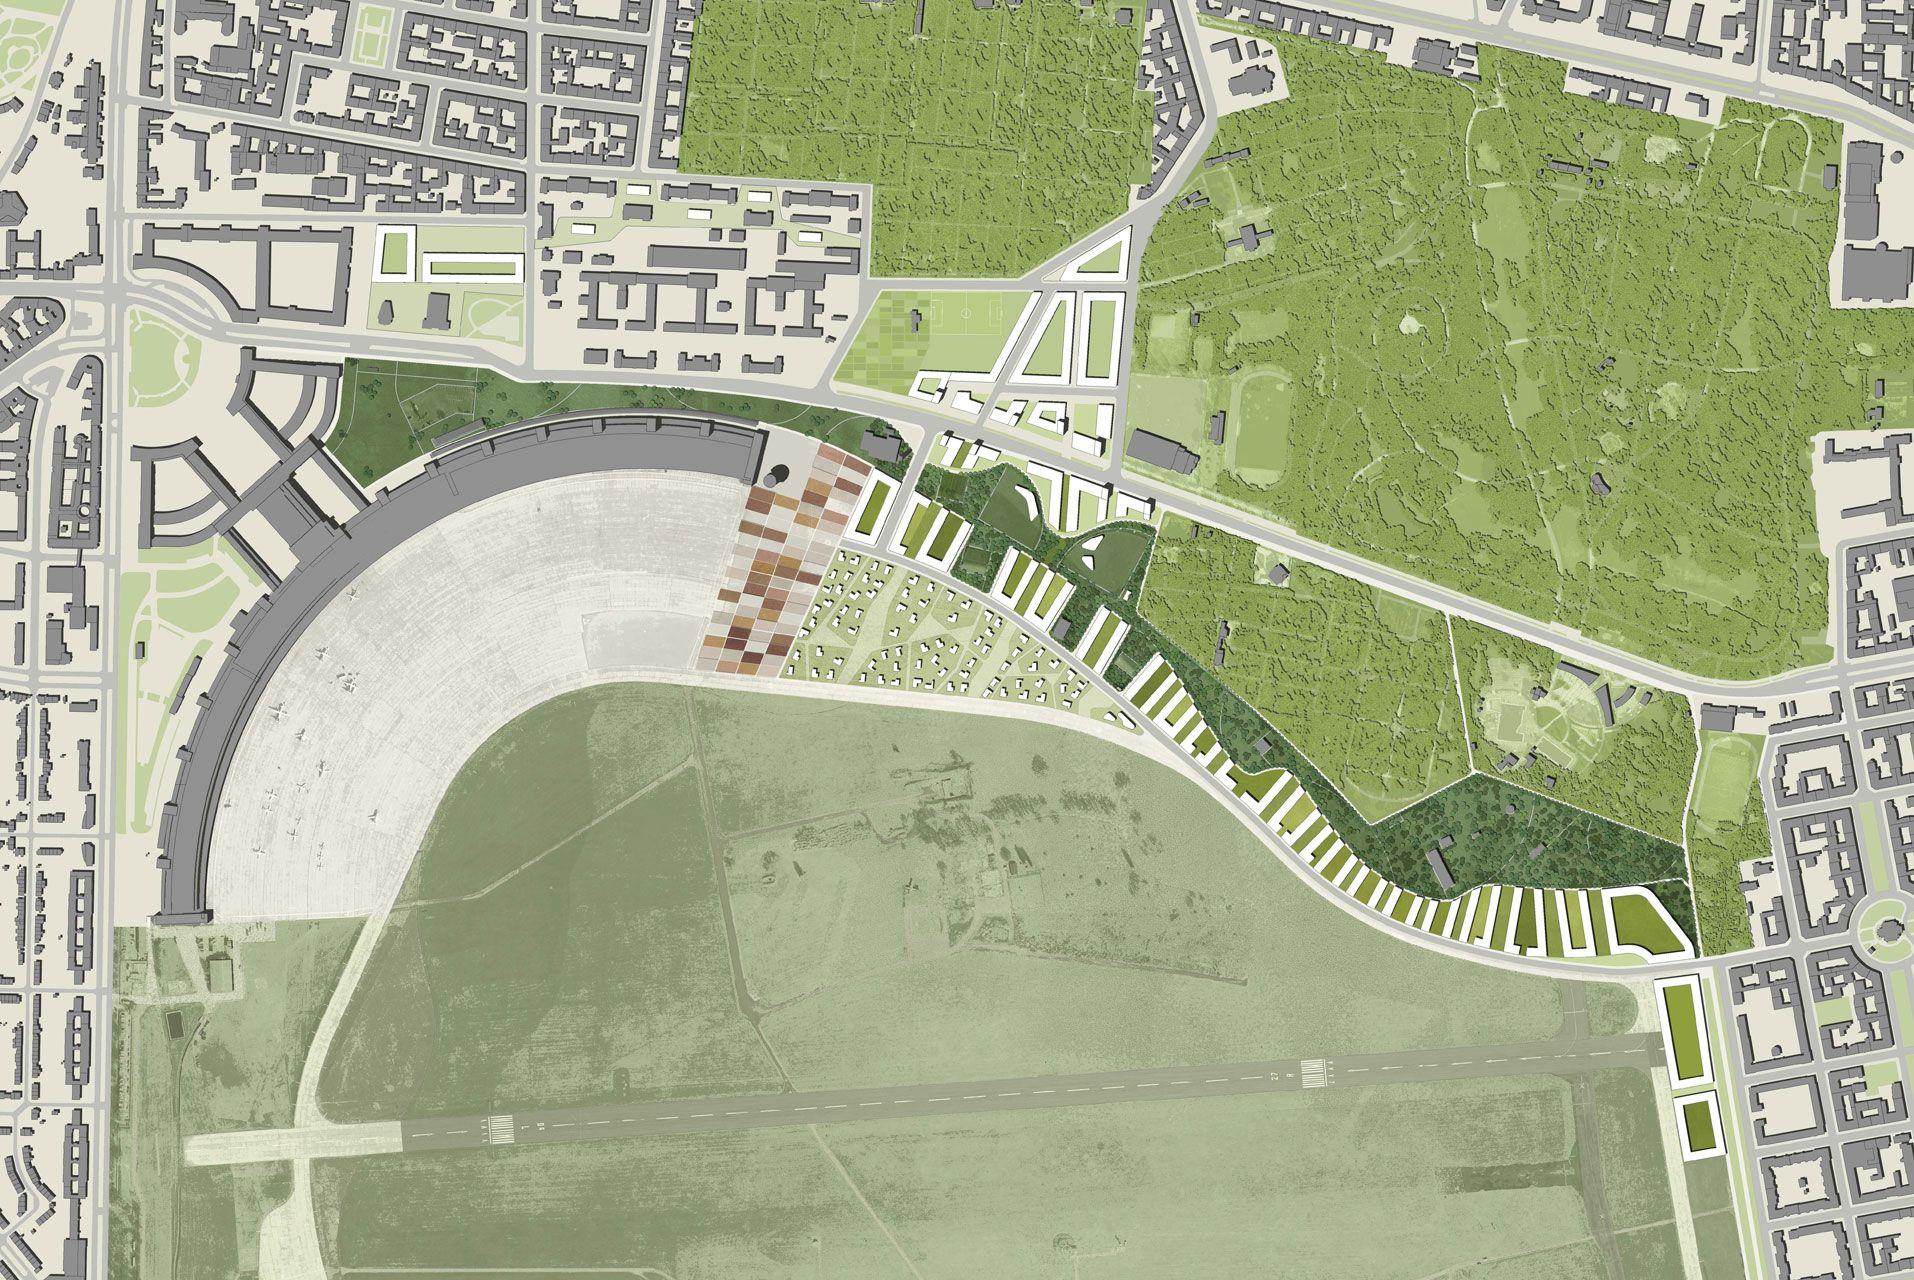 Columbiaquartier Site Plan